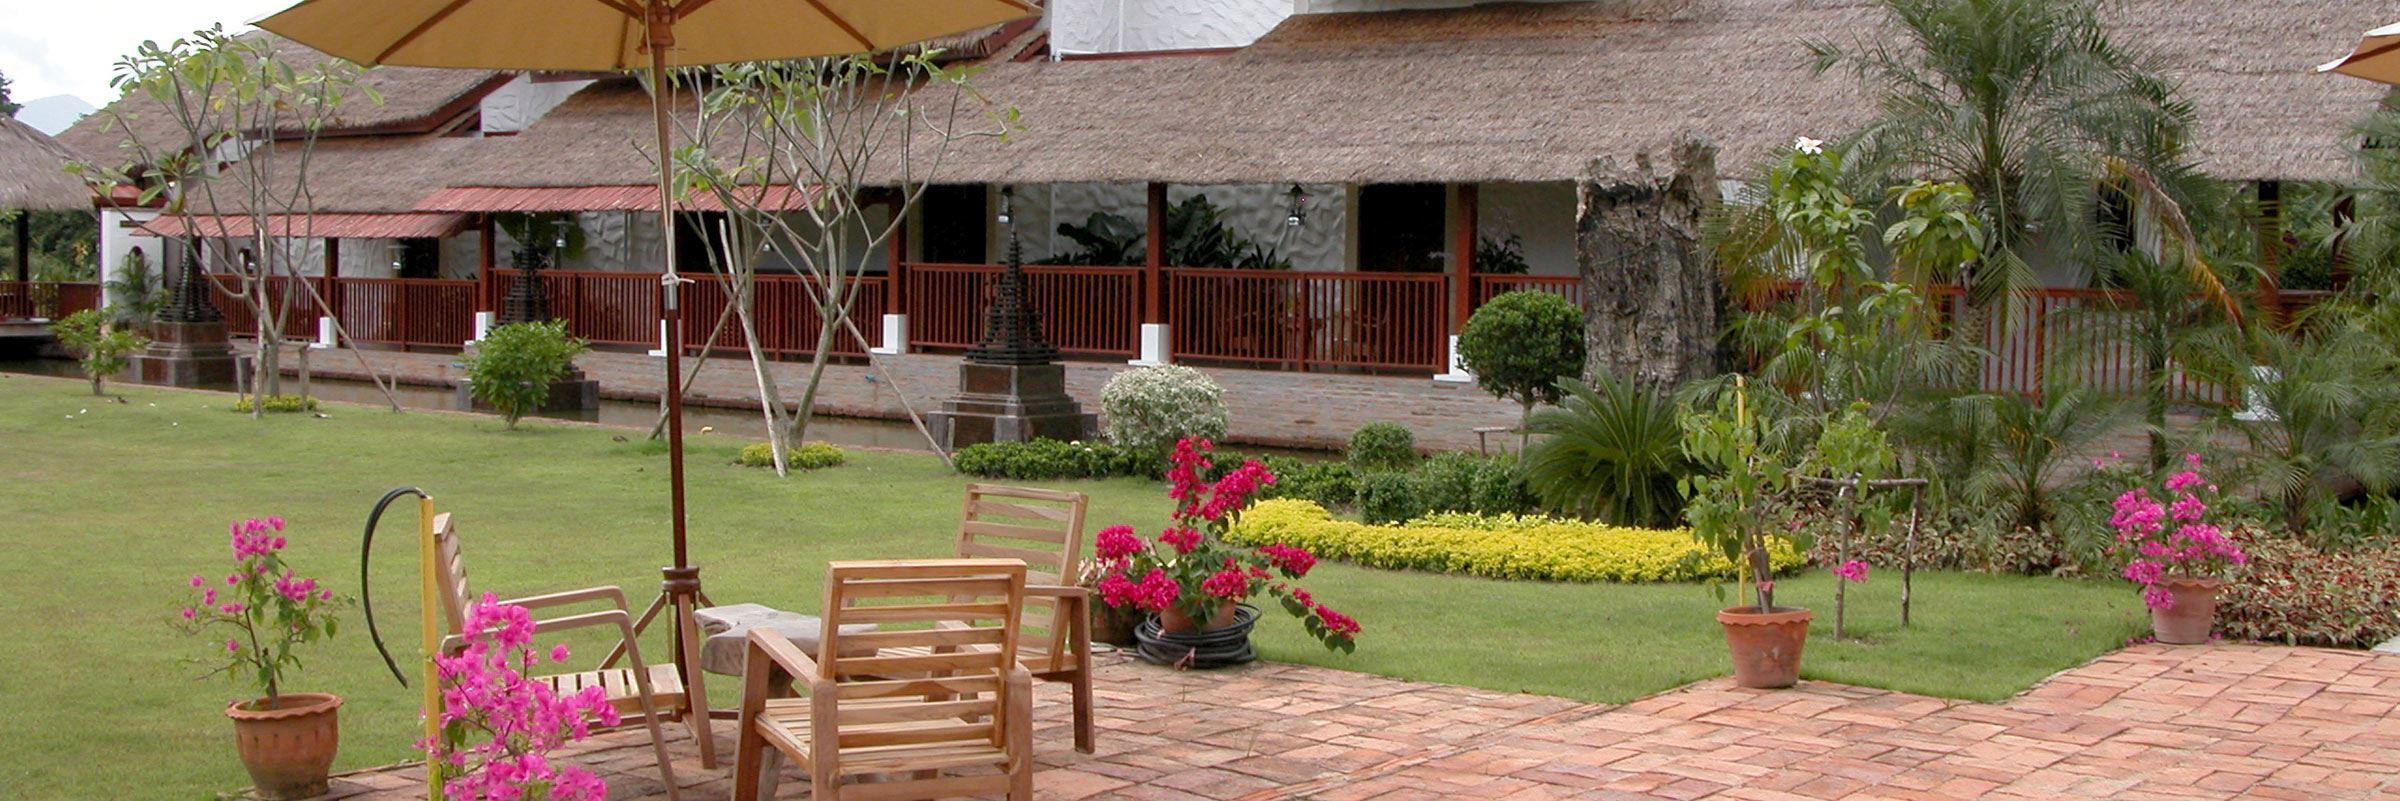 tharaburi resort hotels in sukhothai audley travel rh audleytravel com